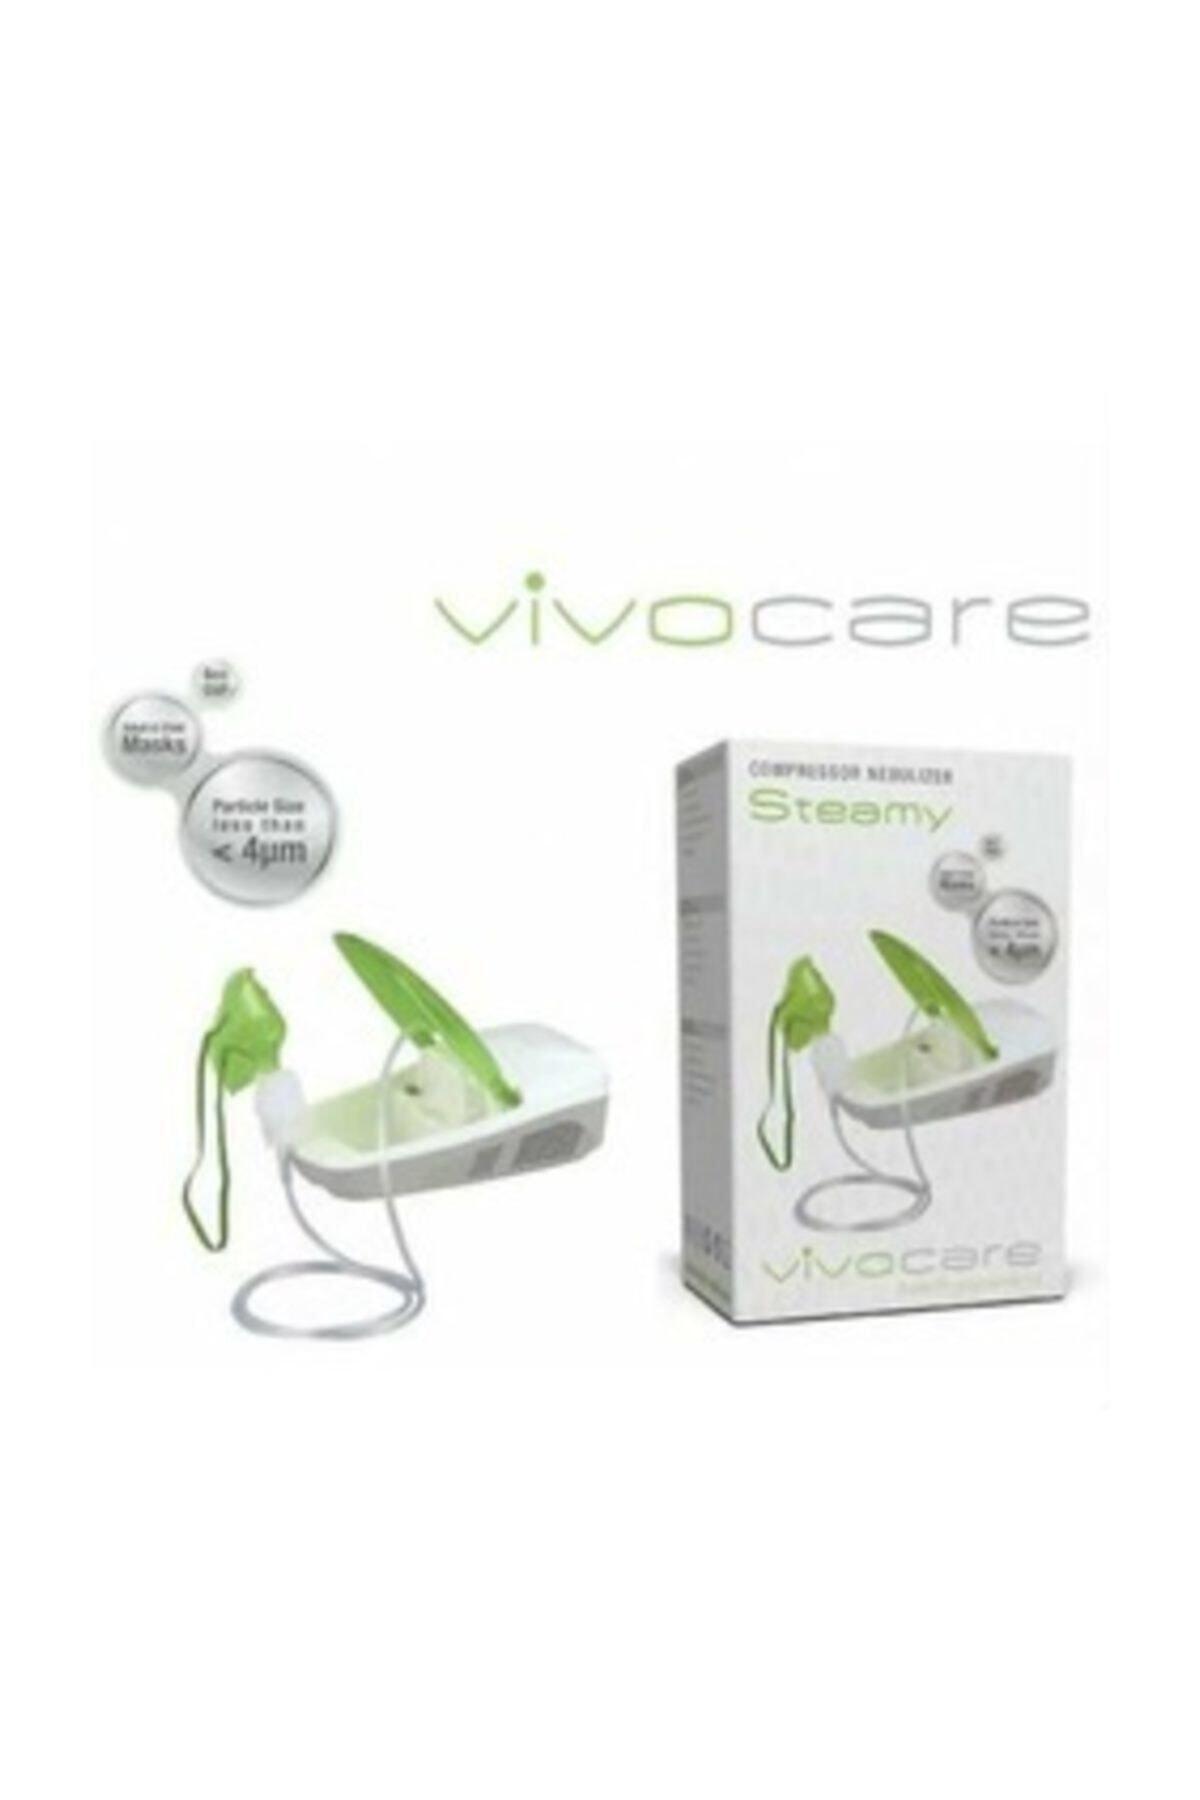 PlusMed Vivocare Steamy Kompresörlü Nebulizatör Cihazı - Buhar Makinesi 1